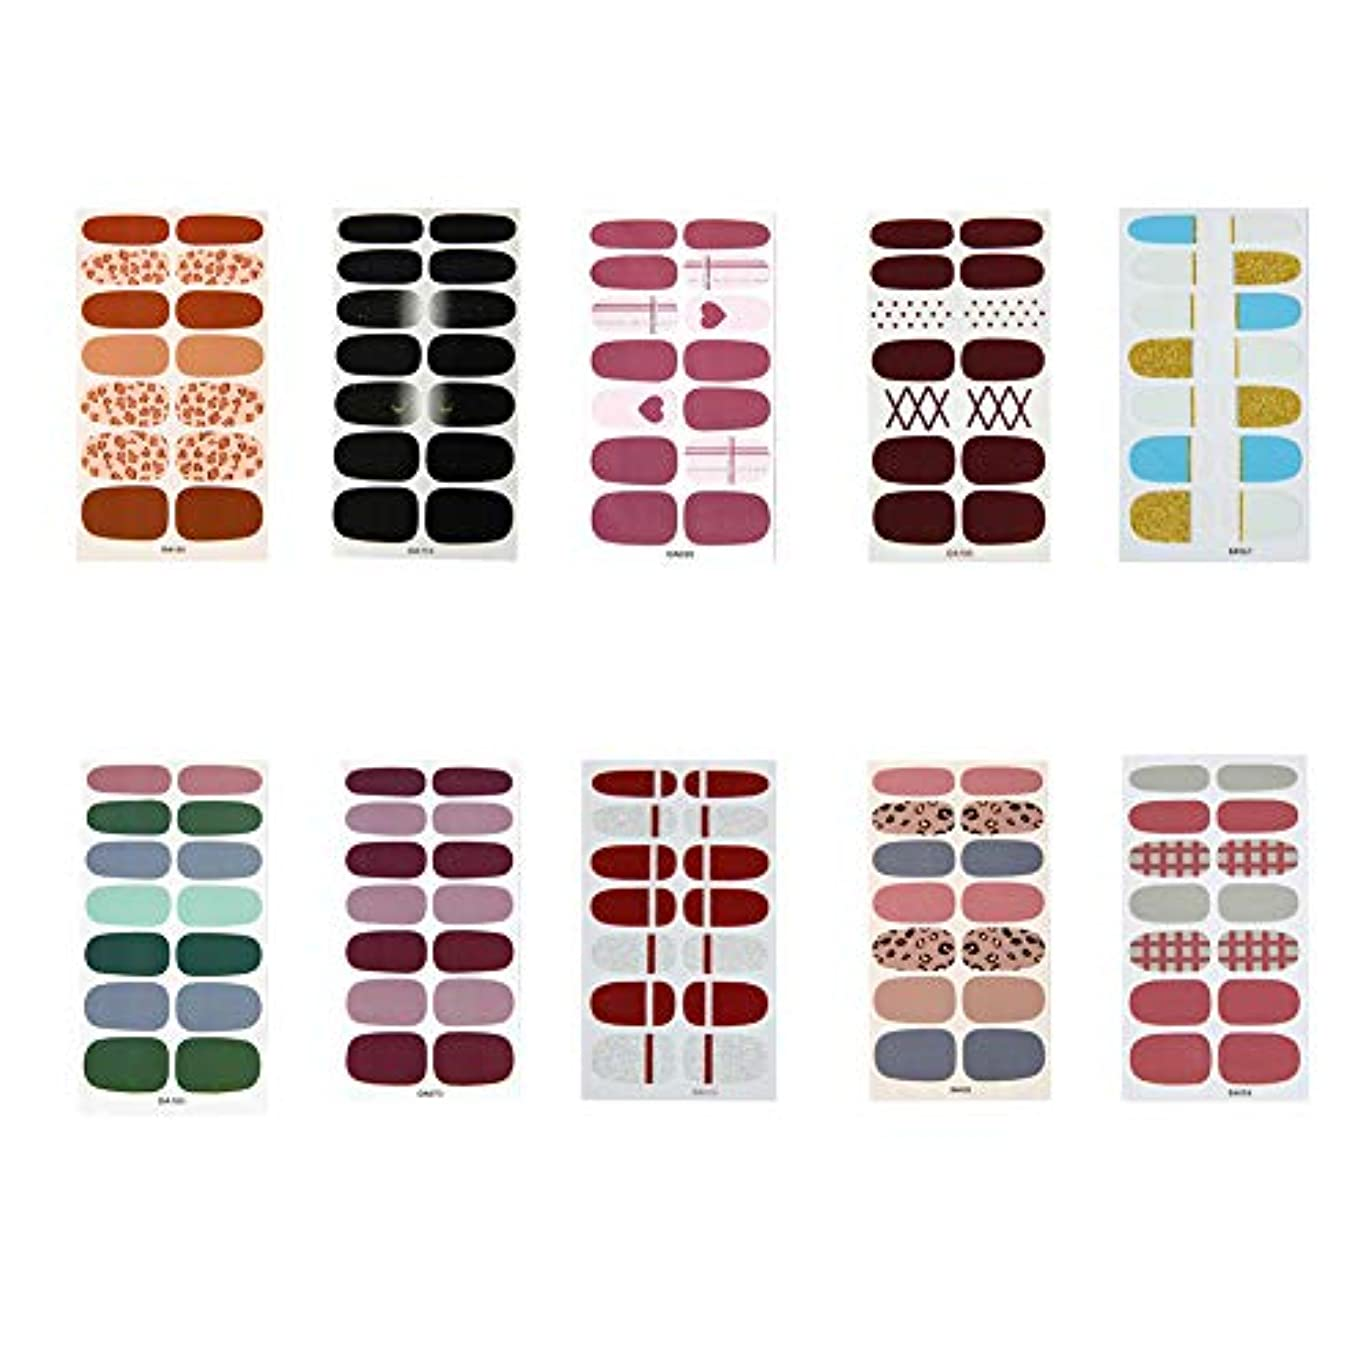 PoonikuuDIYネイル ネイルアートアクセサリー ネイルデザイン ネイルステッカー ネイルシール ネイル飾り 可愛い高級感綺麗 10枚10類